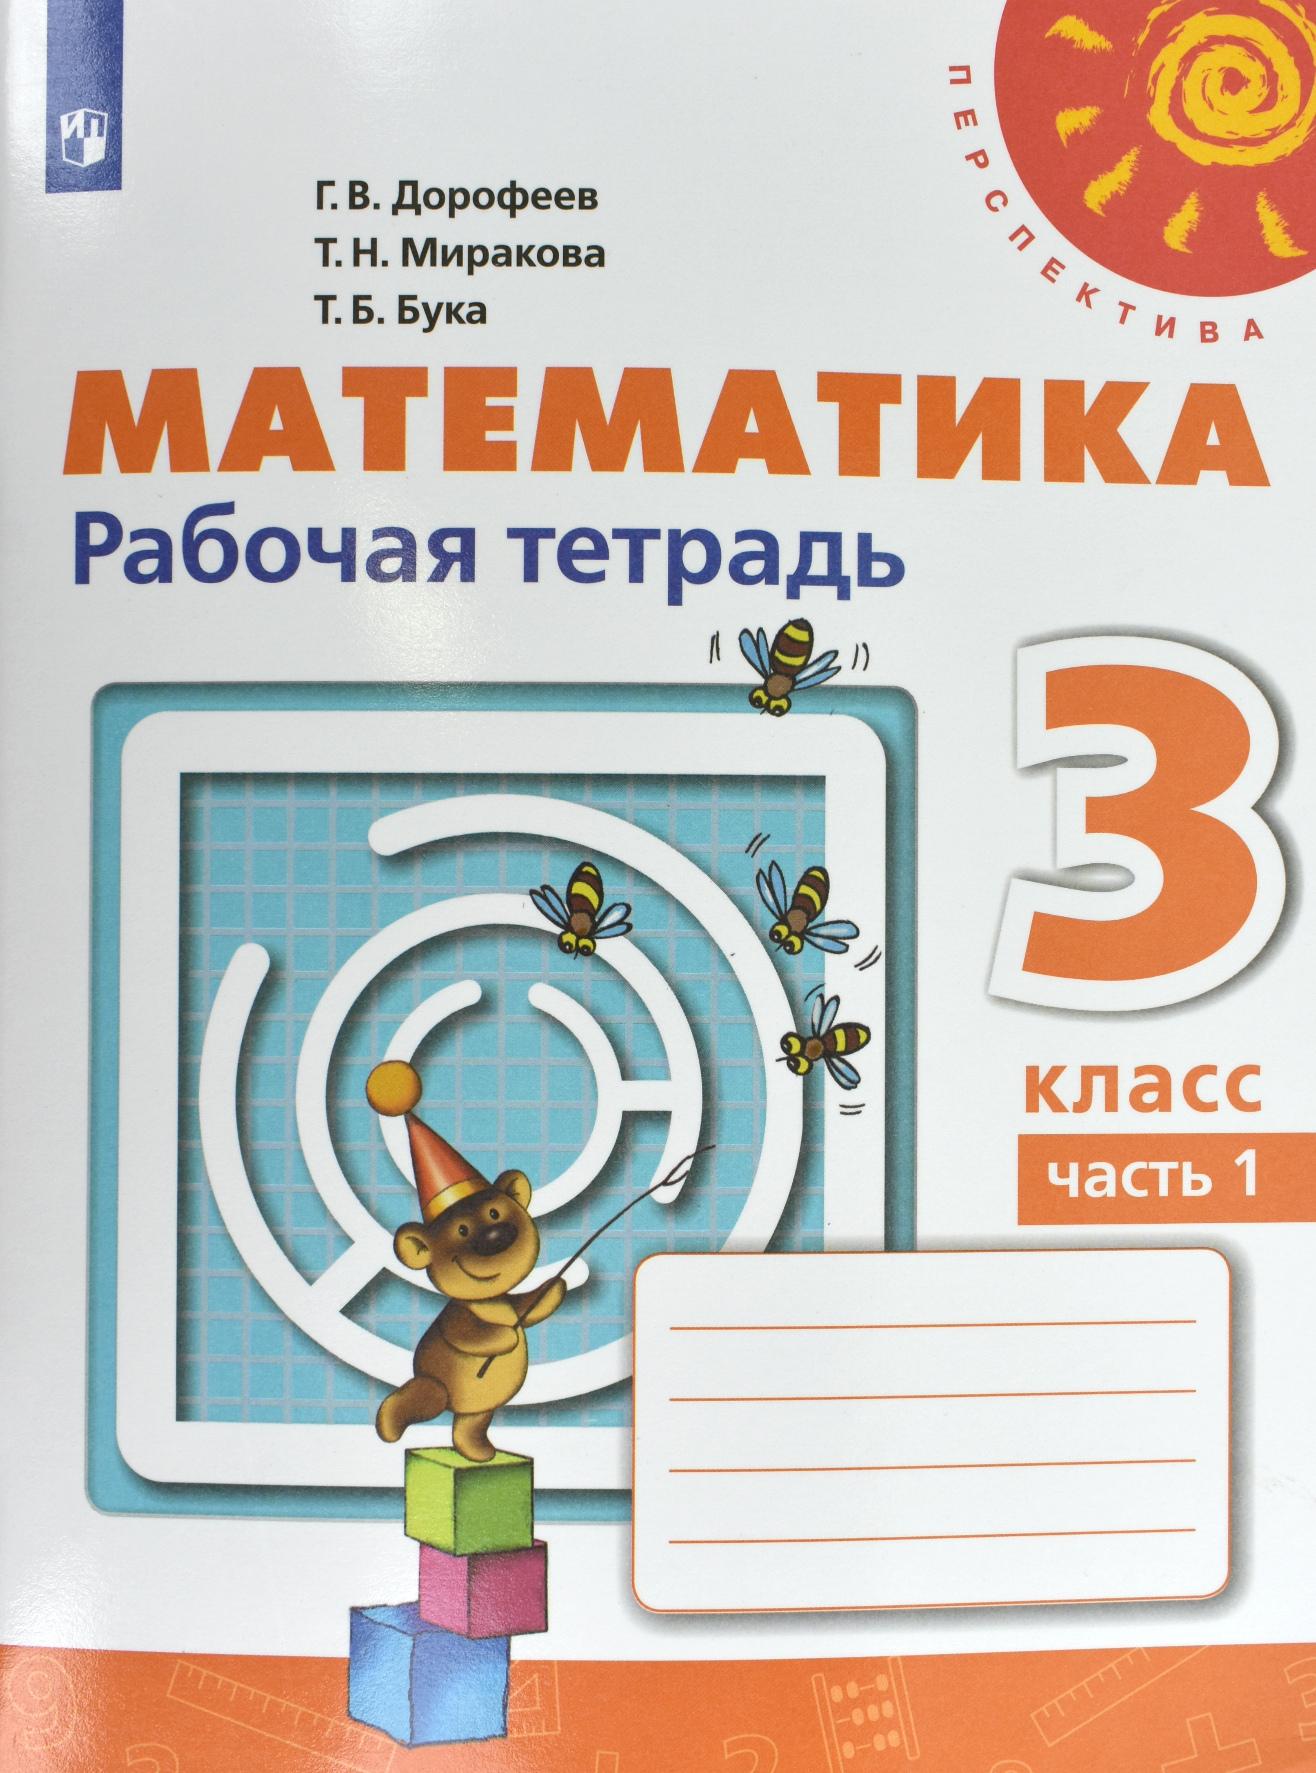 Дорофеев, Математика, Рабочая тетрадь, 3 класс В 2-Х Ч.Ч, 1 перспектива